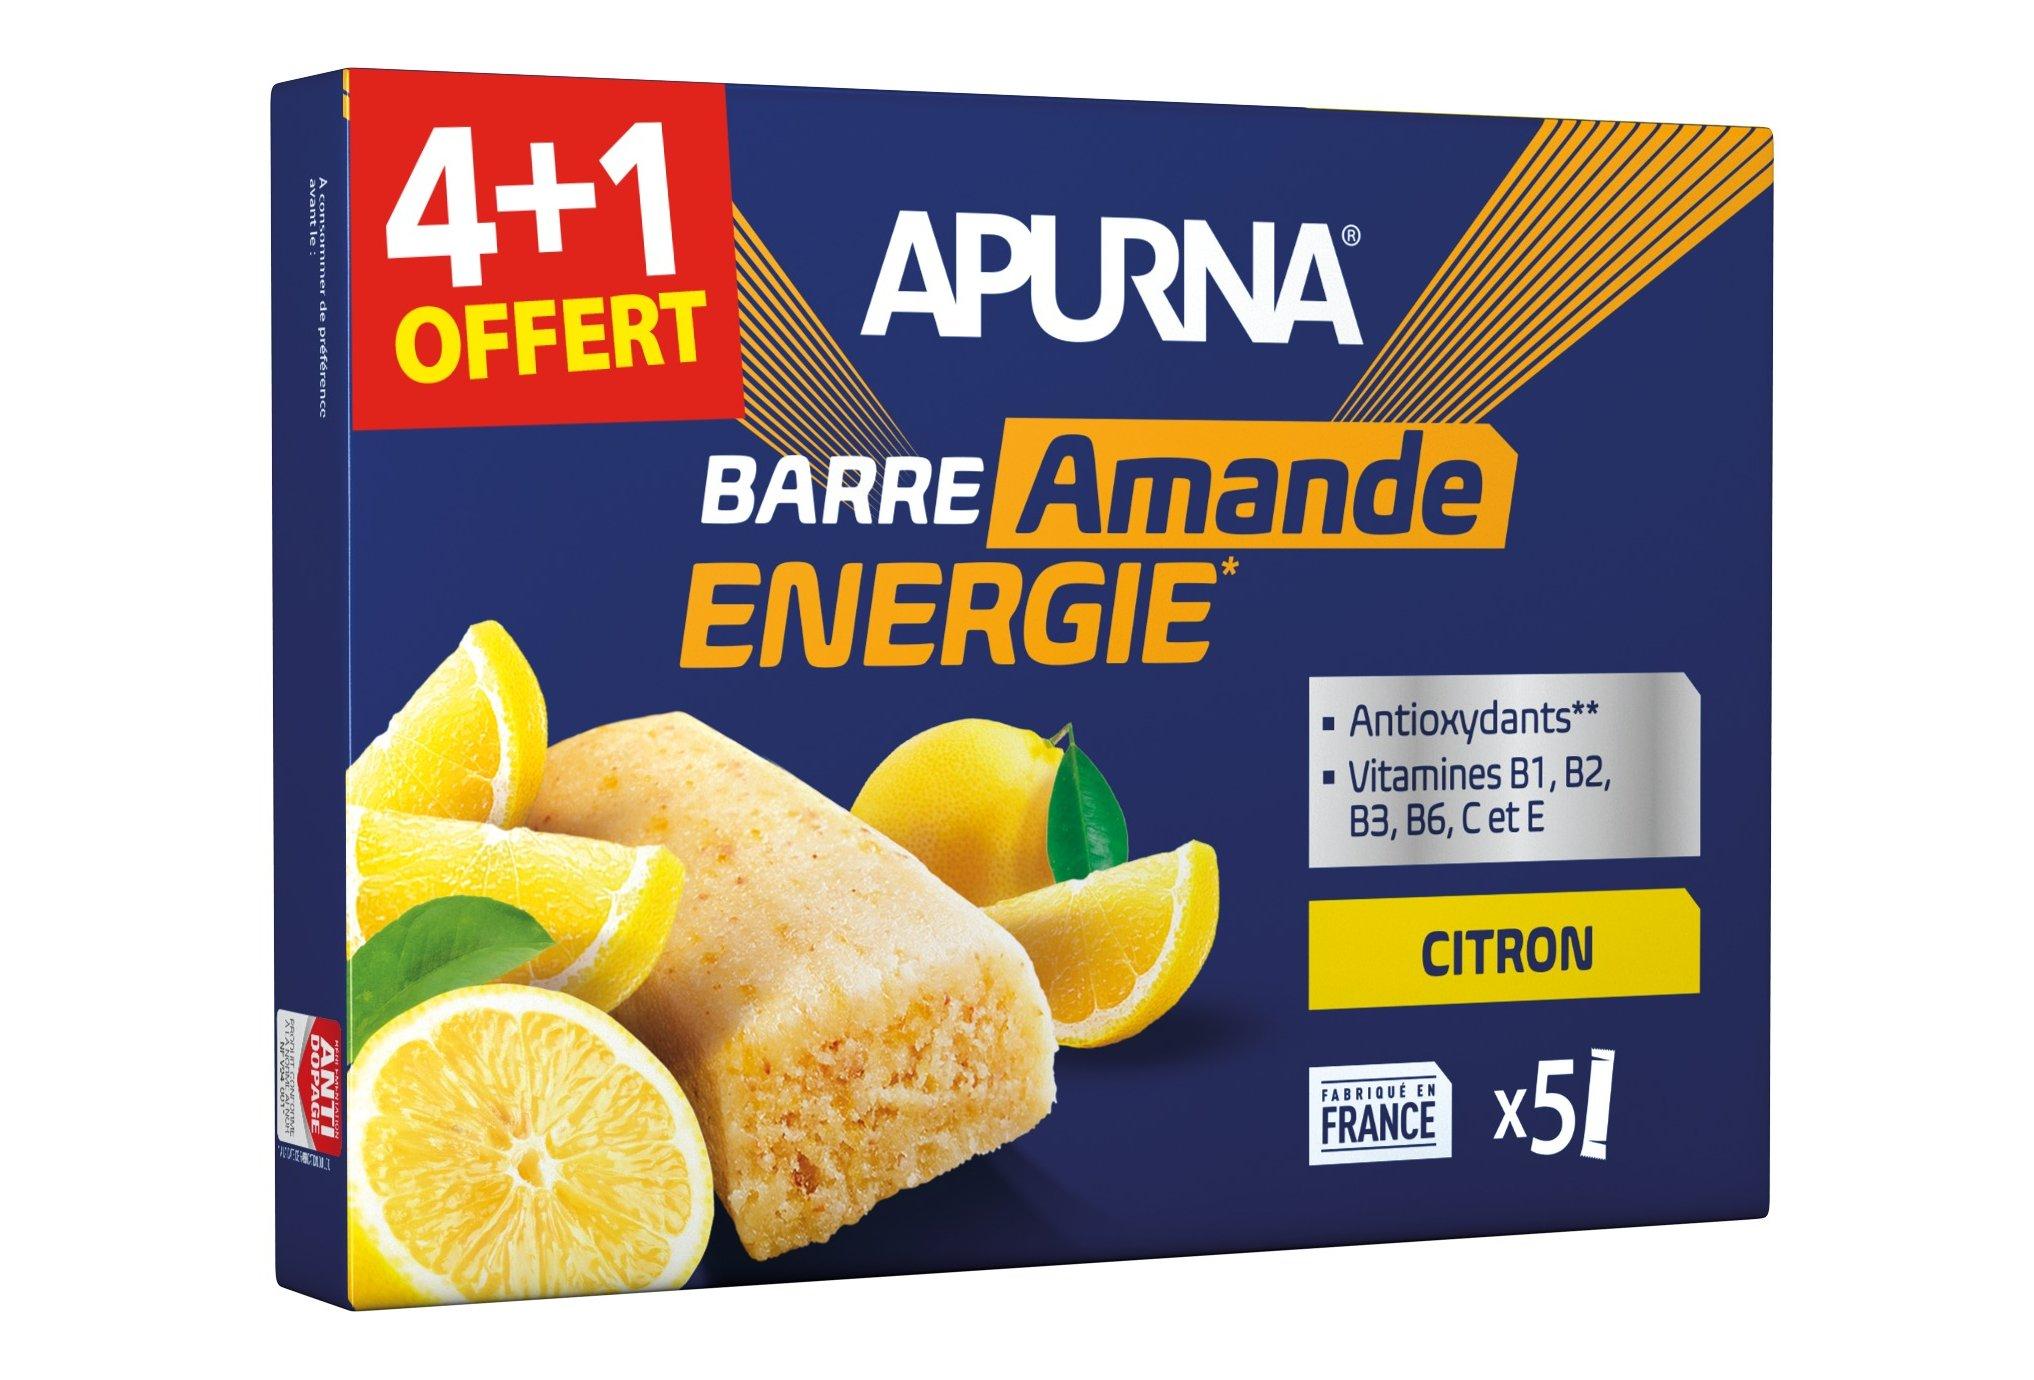 Apurna Pack de barras energéticas limón/almendra 4+1 Diététique Barres